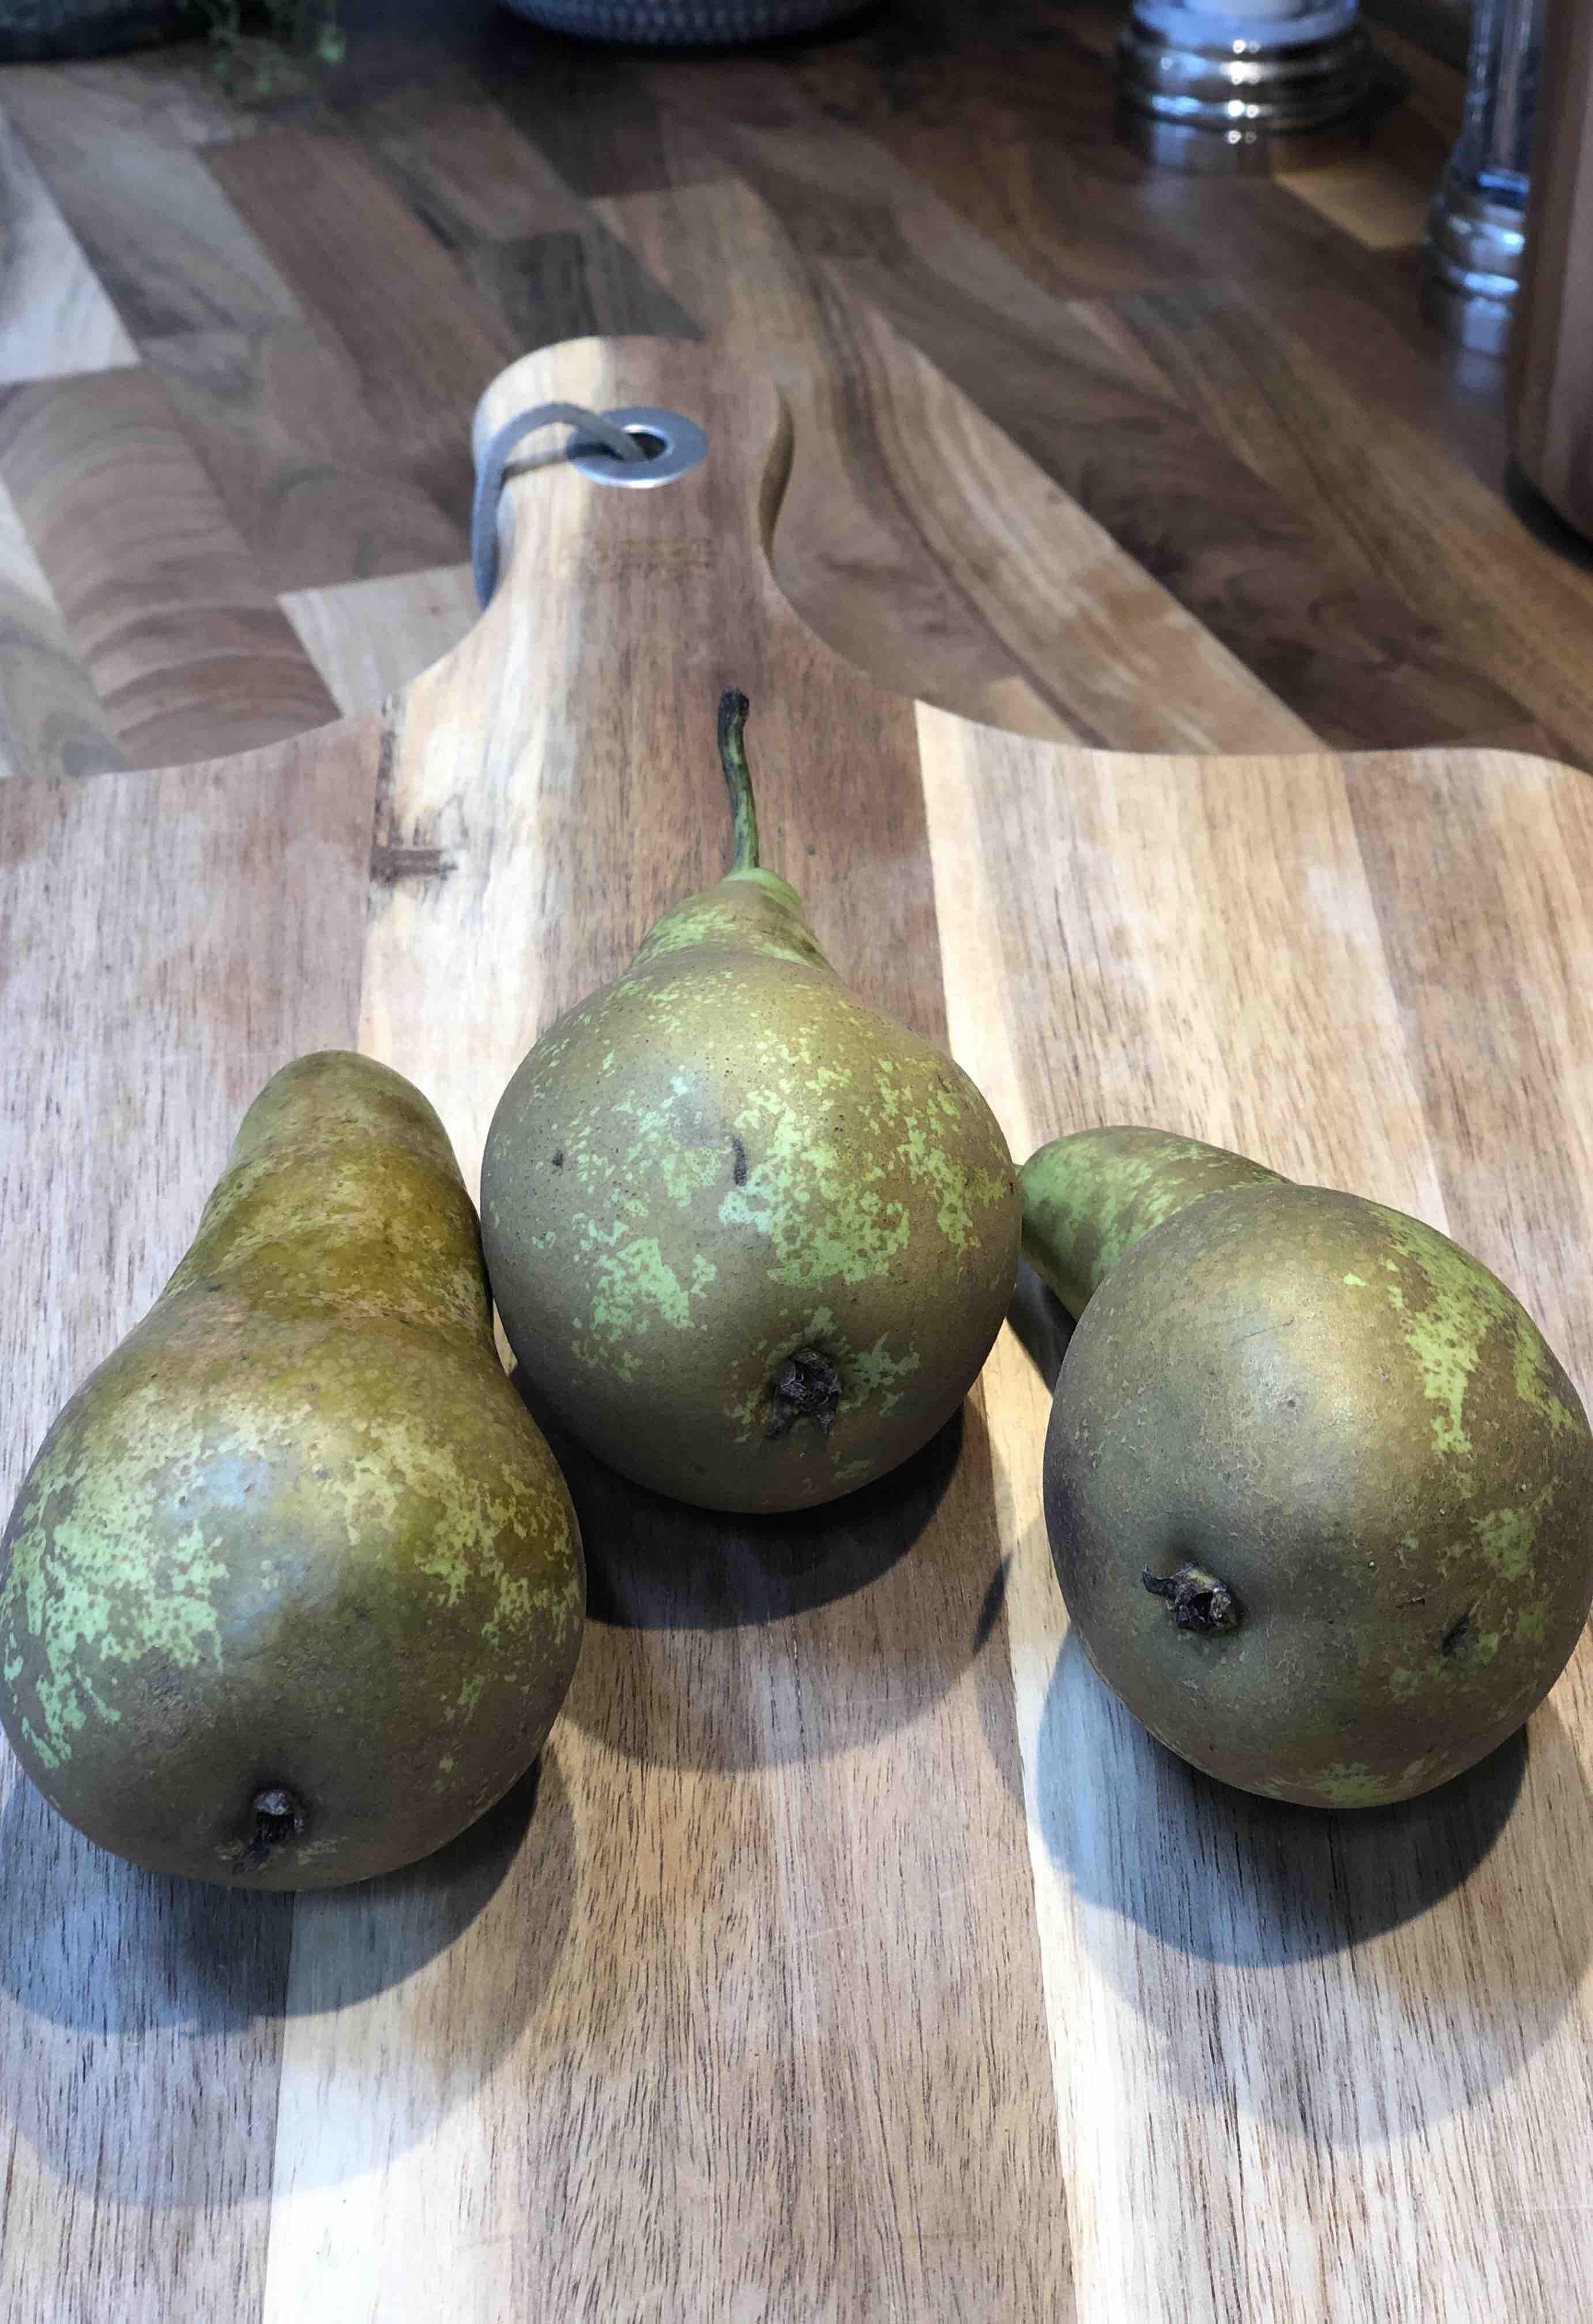 Fruit - Pears